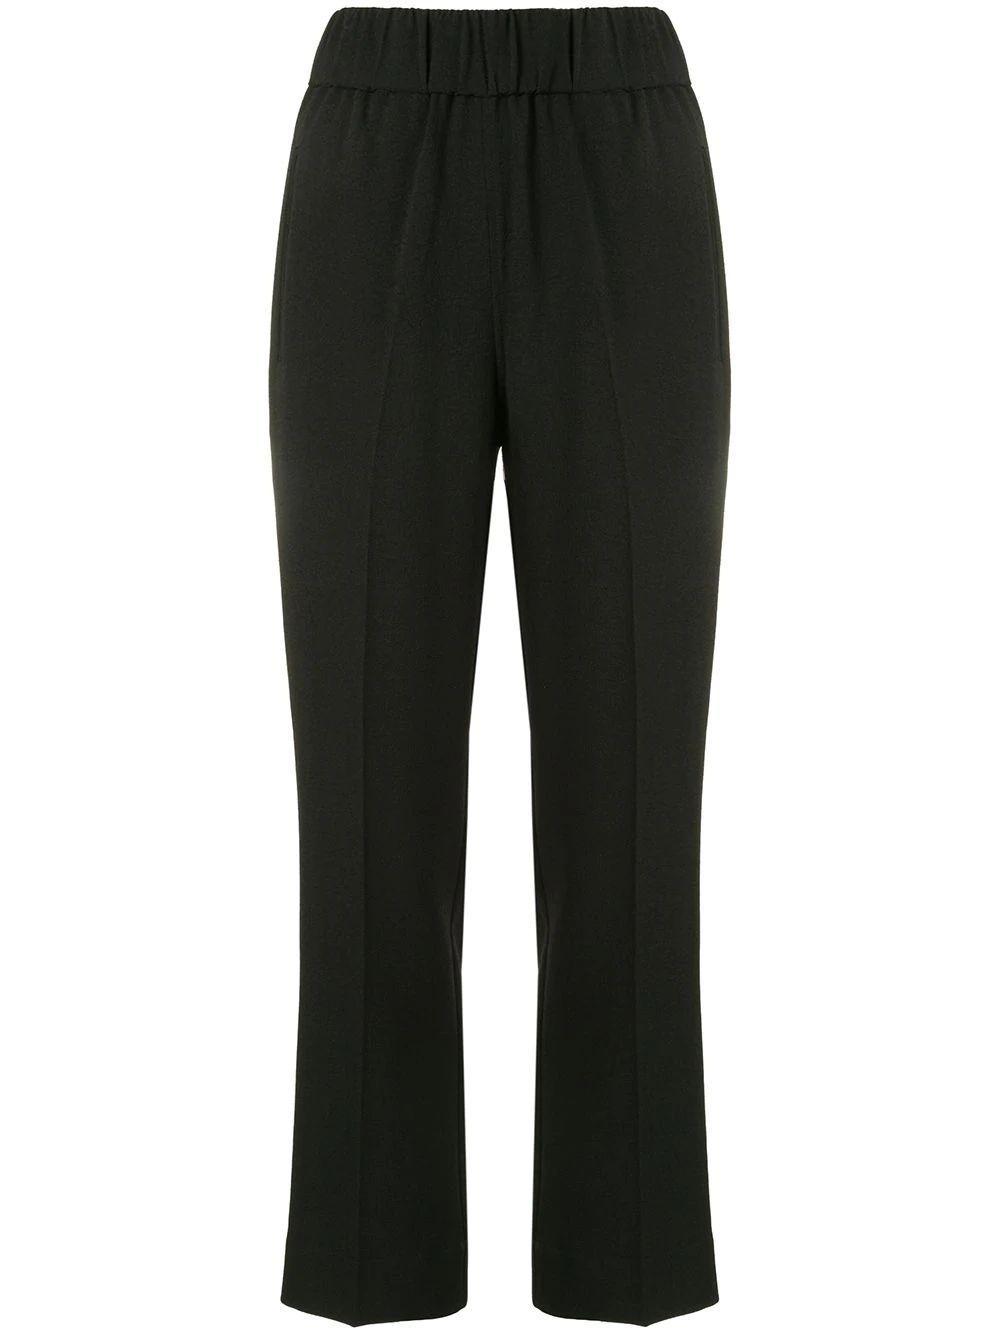 Heavy Crepe Elastic Waist Pants